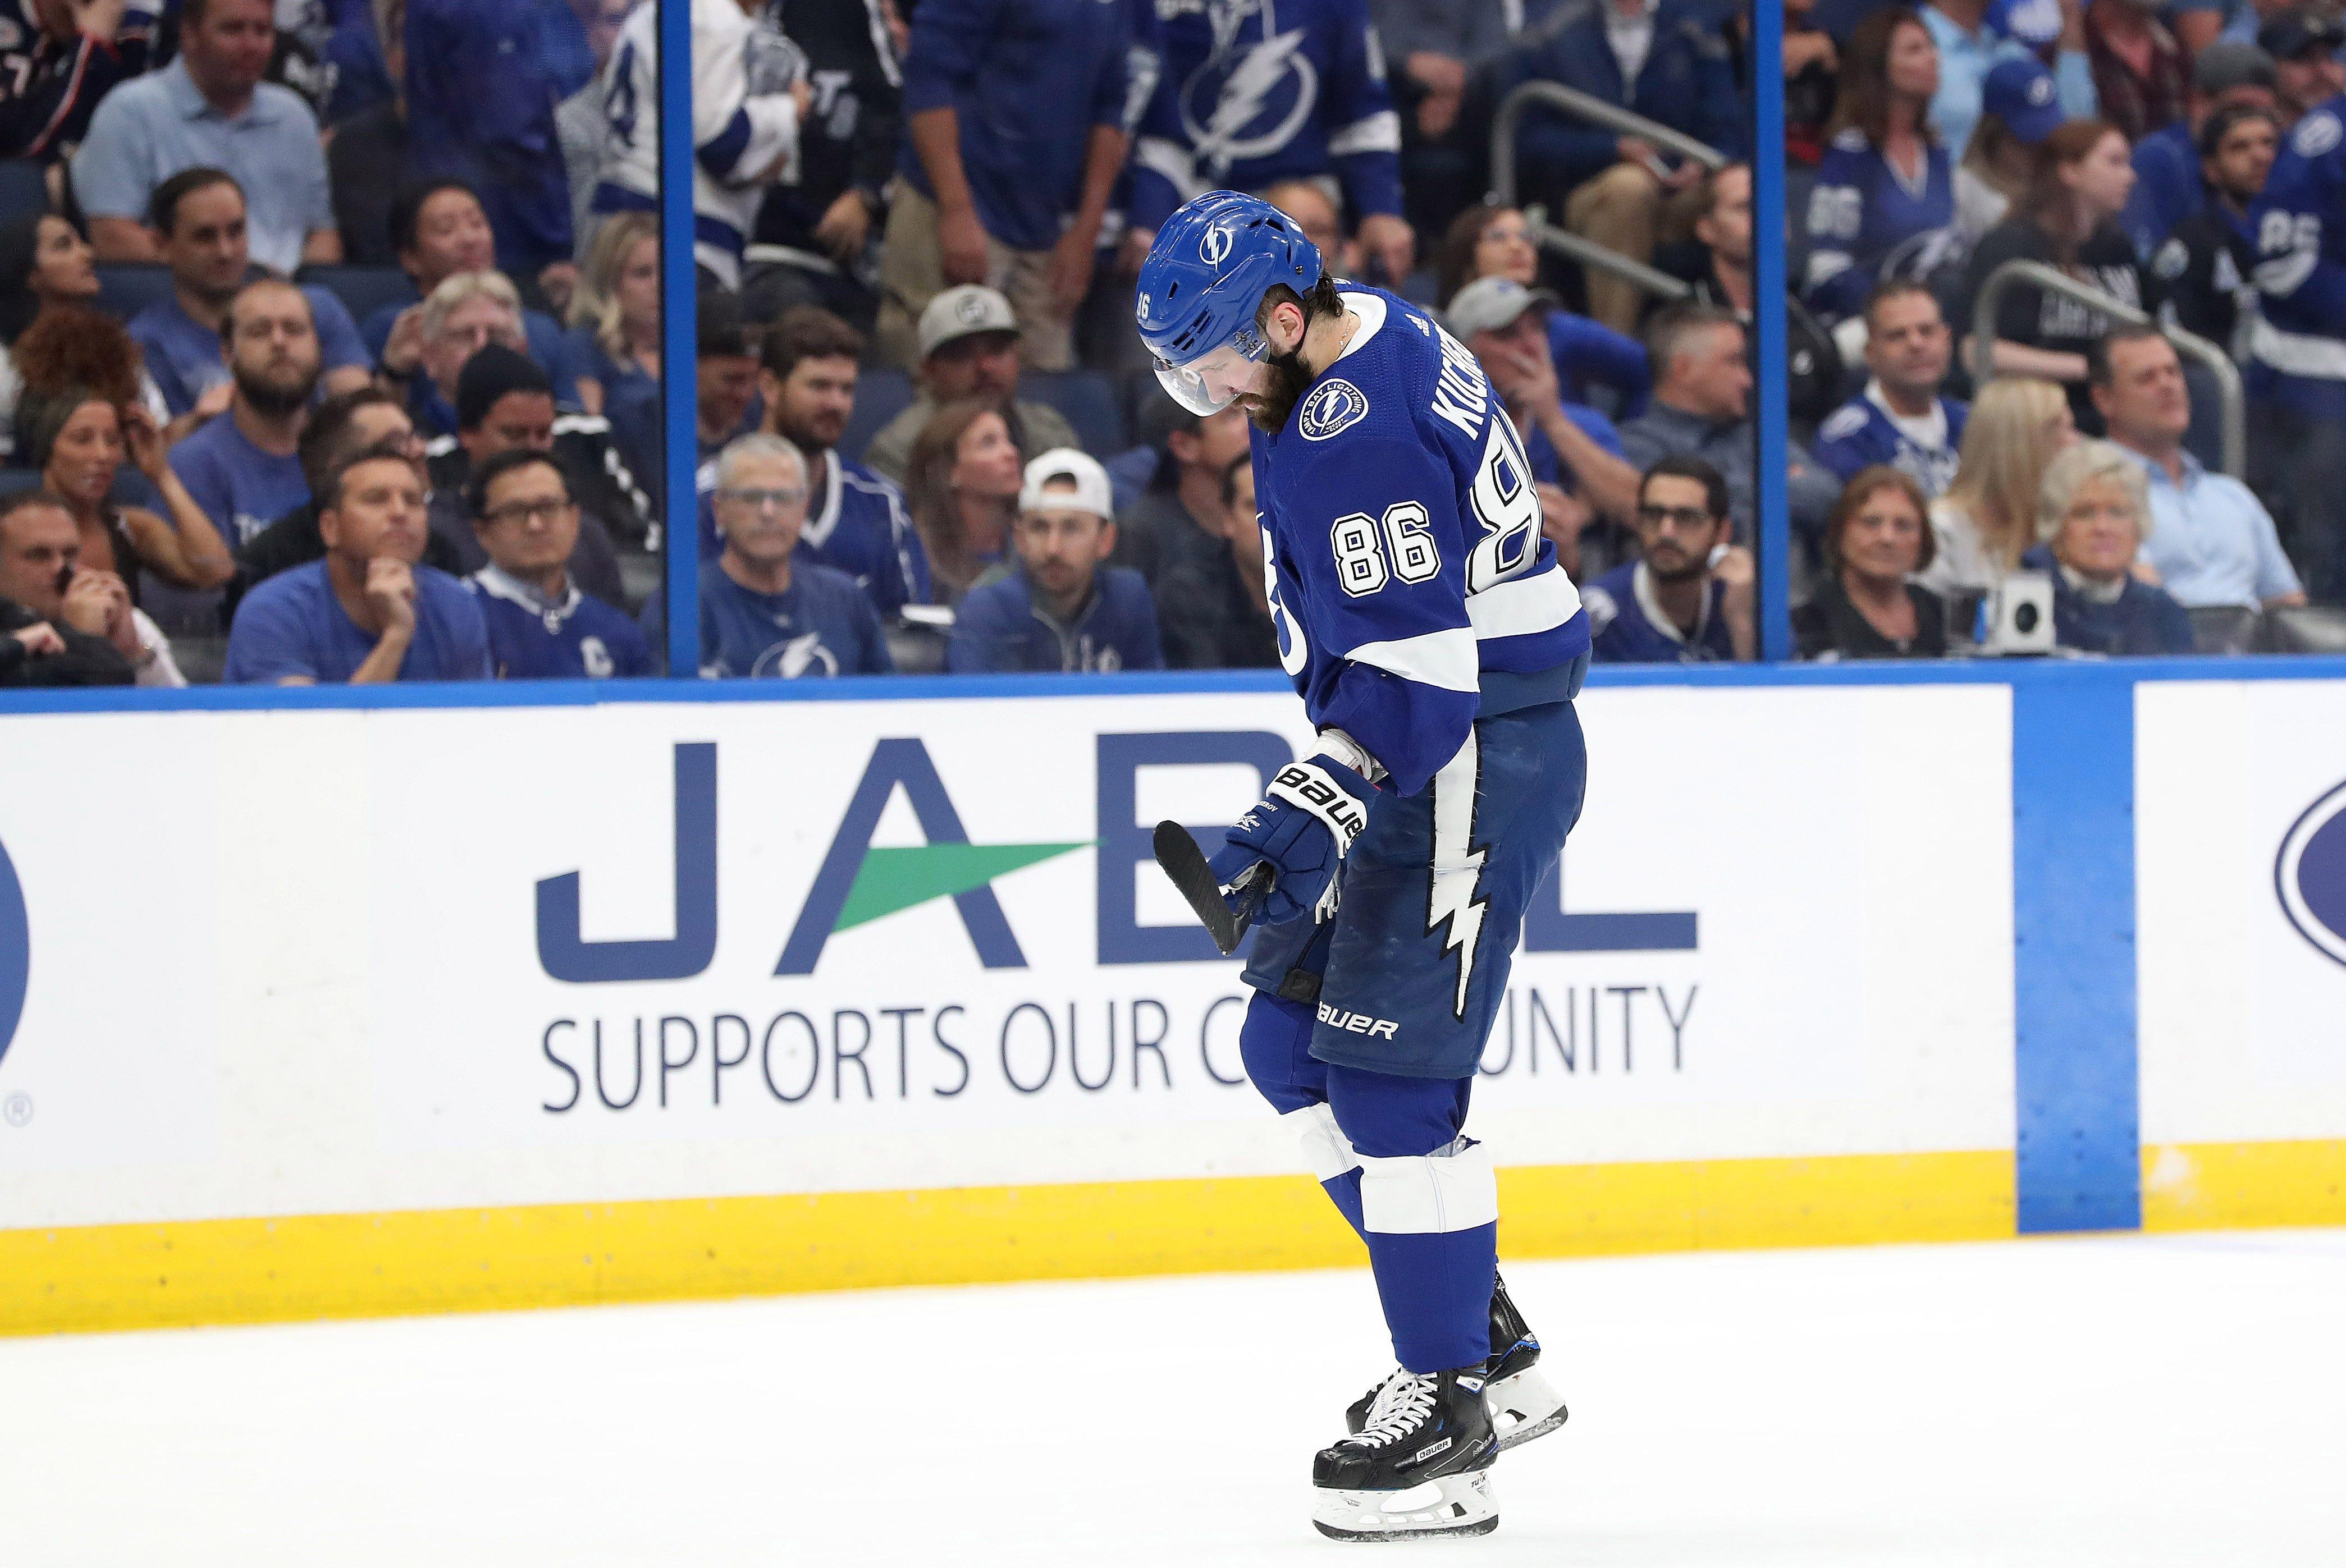 Lightning, NHL's top regular-season team, gets swept: Here are 8